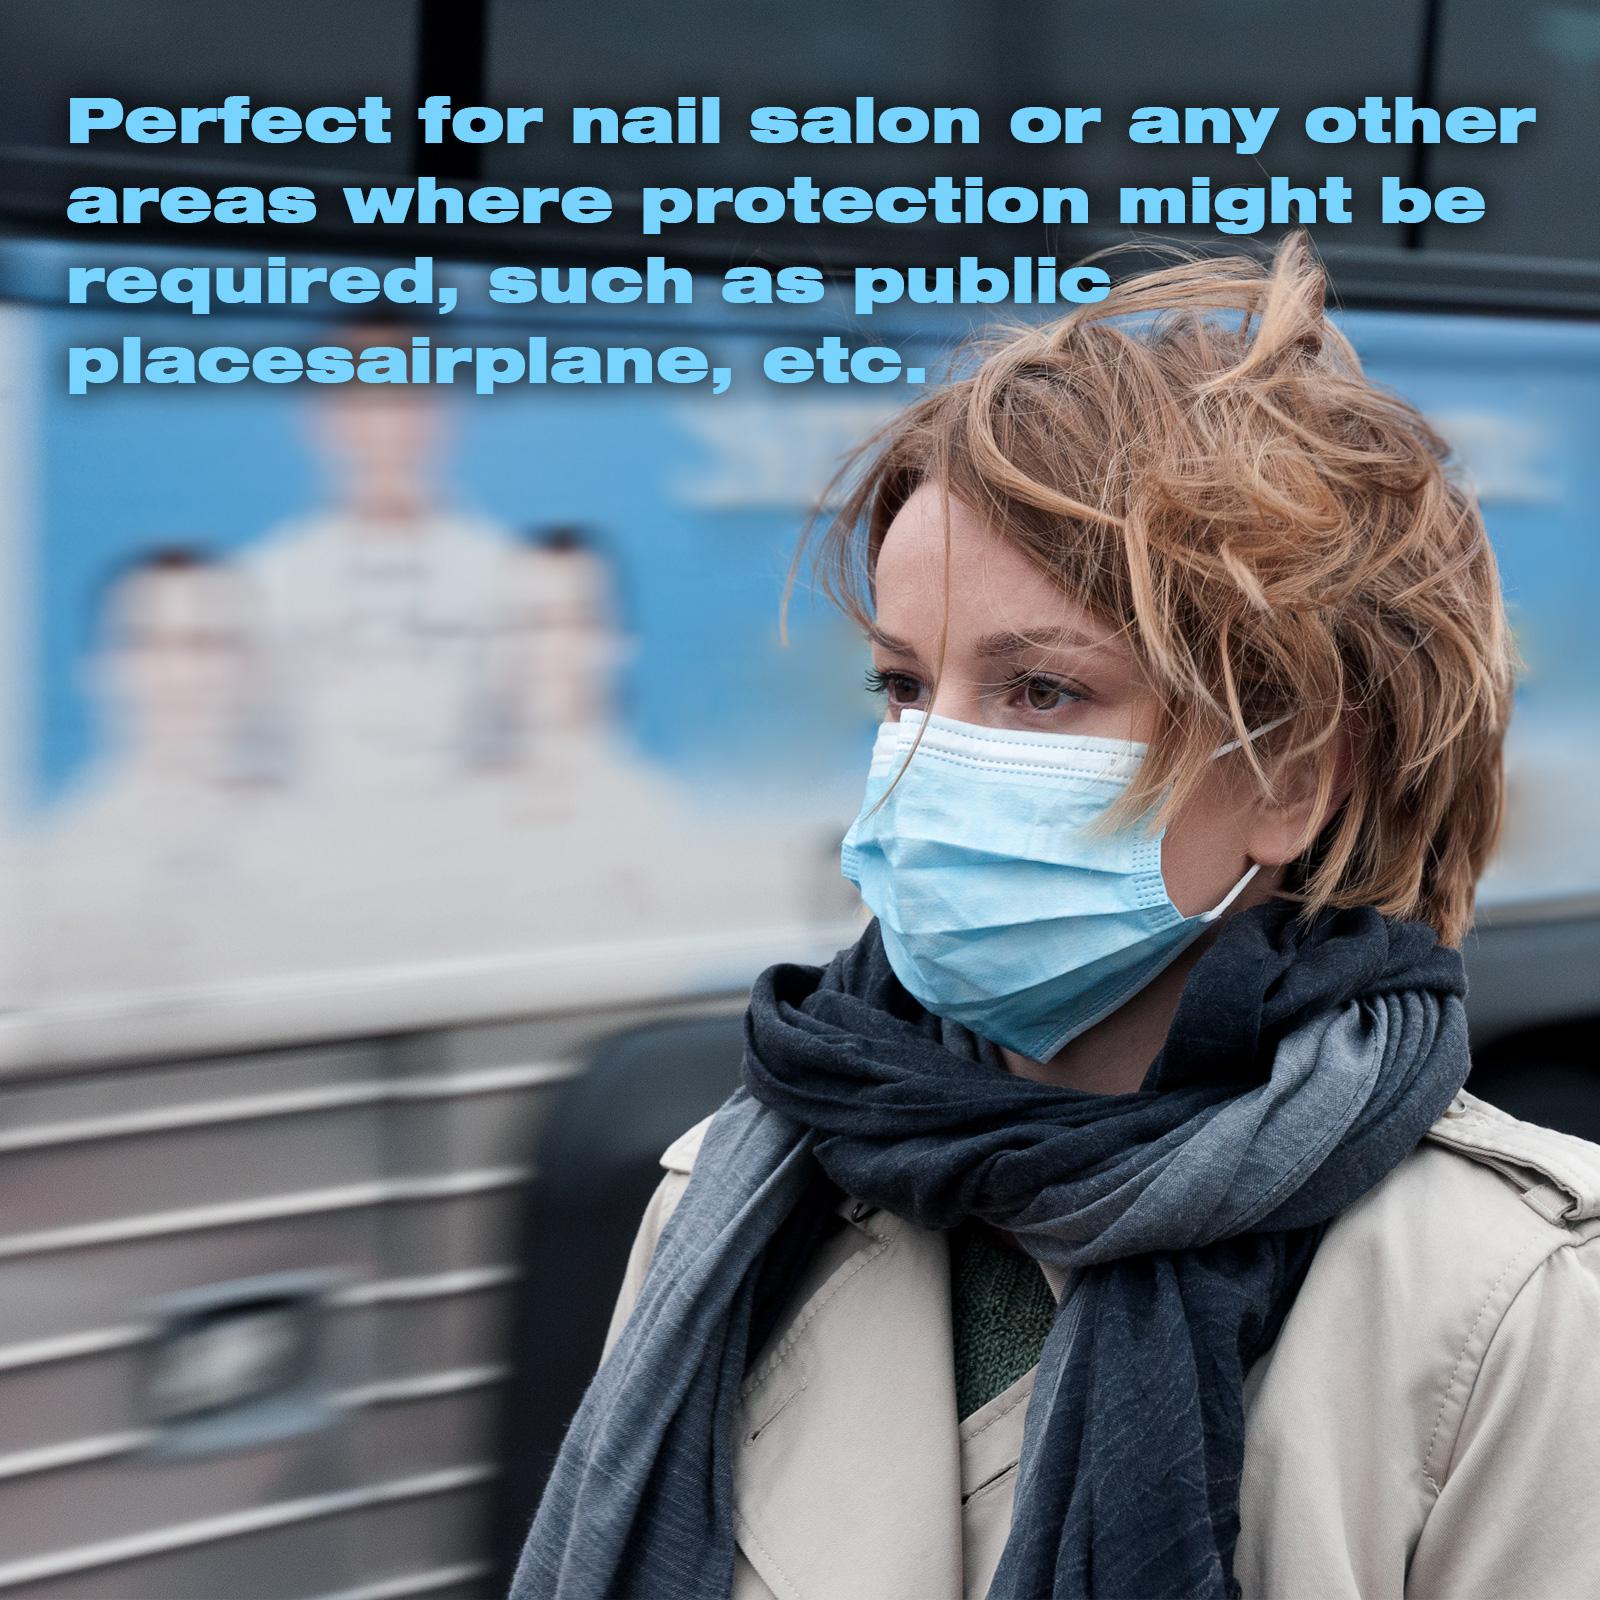 thumbnail 48 - 50/100pcs Disposable Face Mask Protective Mouth Masks 3 Layer Meltblown Filter